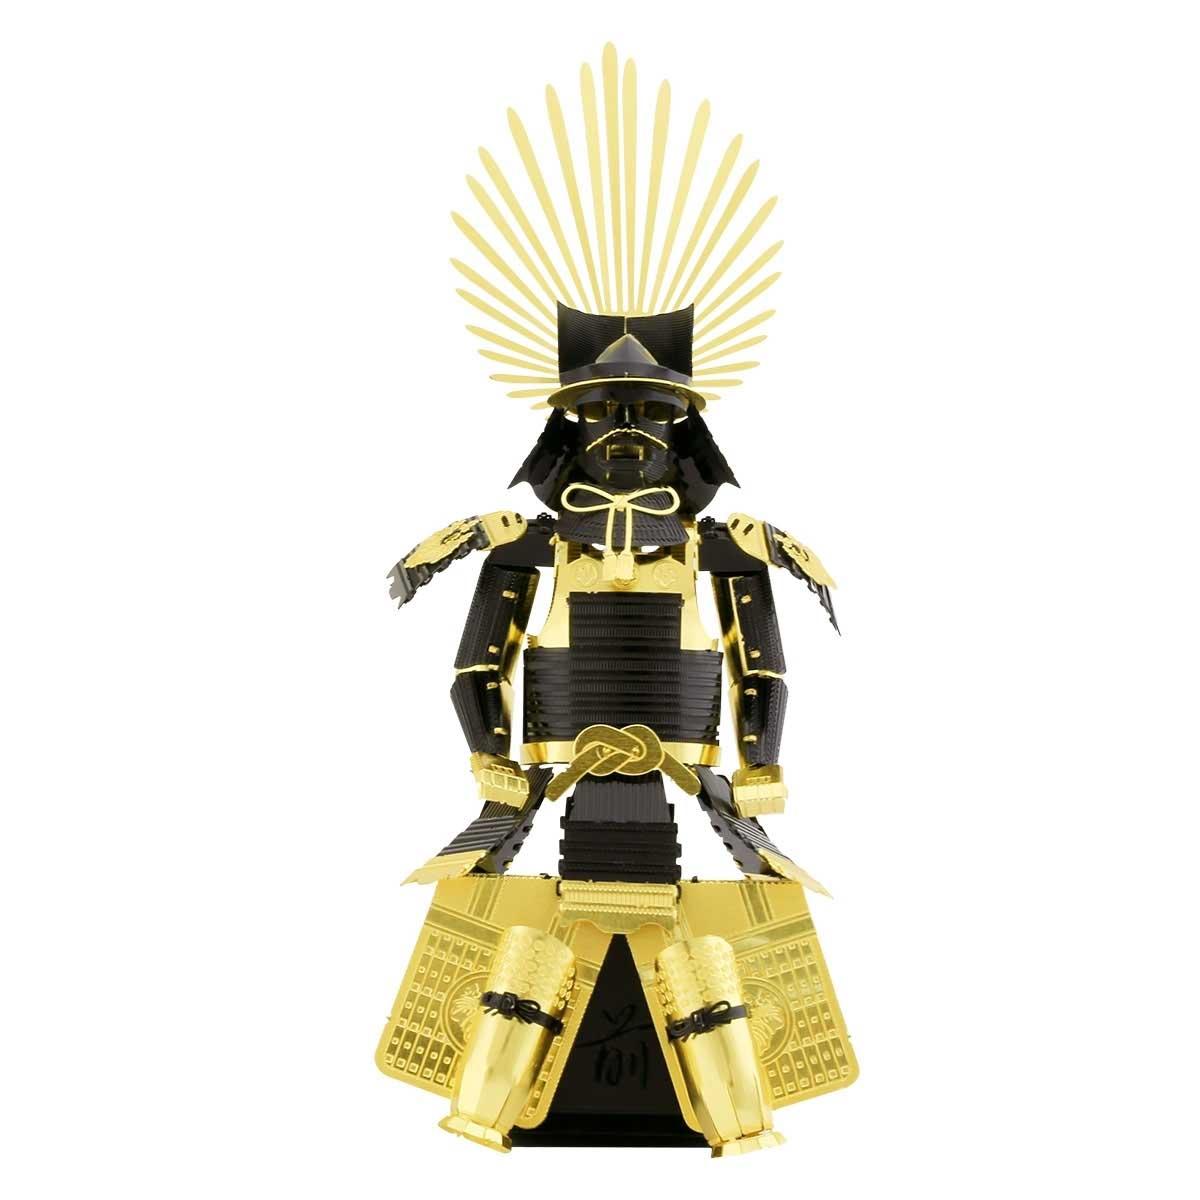 Japanese (Toyotomi Armor) Japan Metal Puzzles